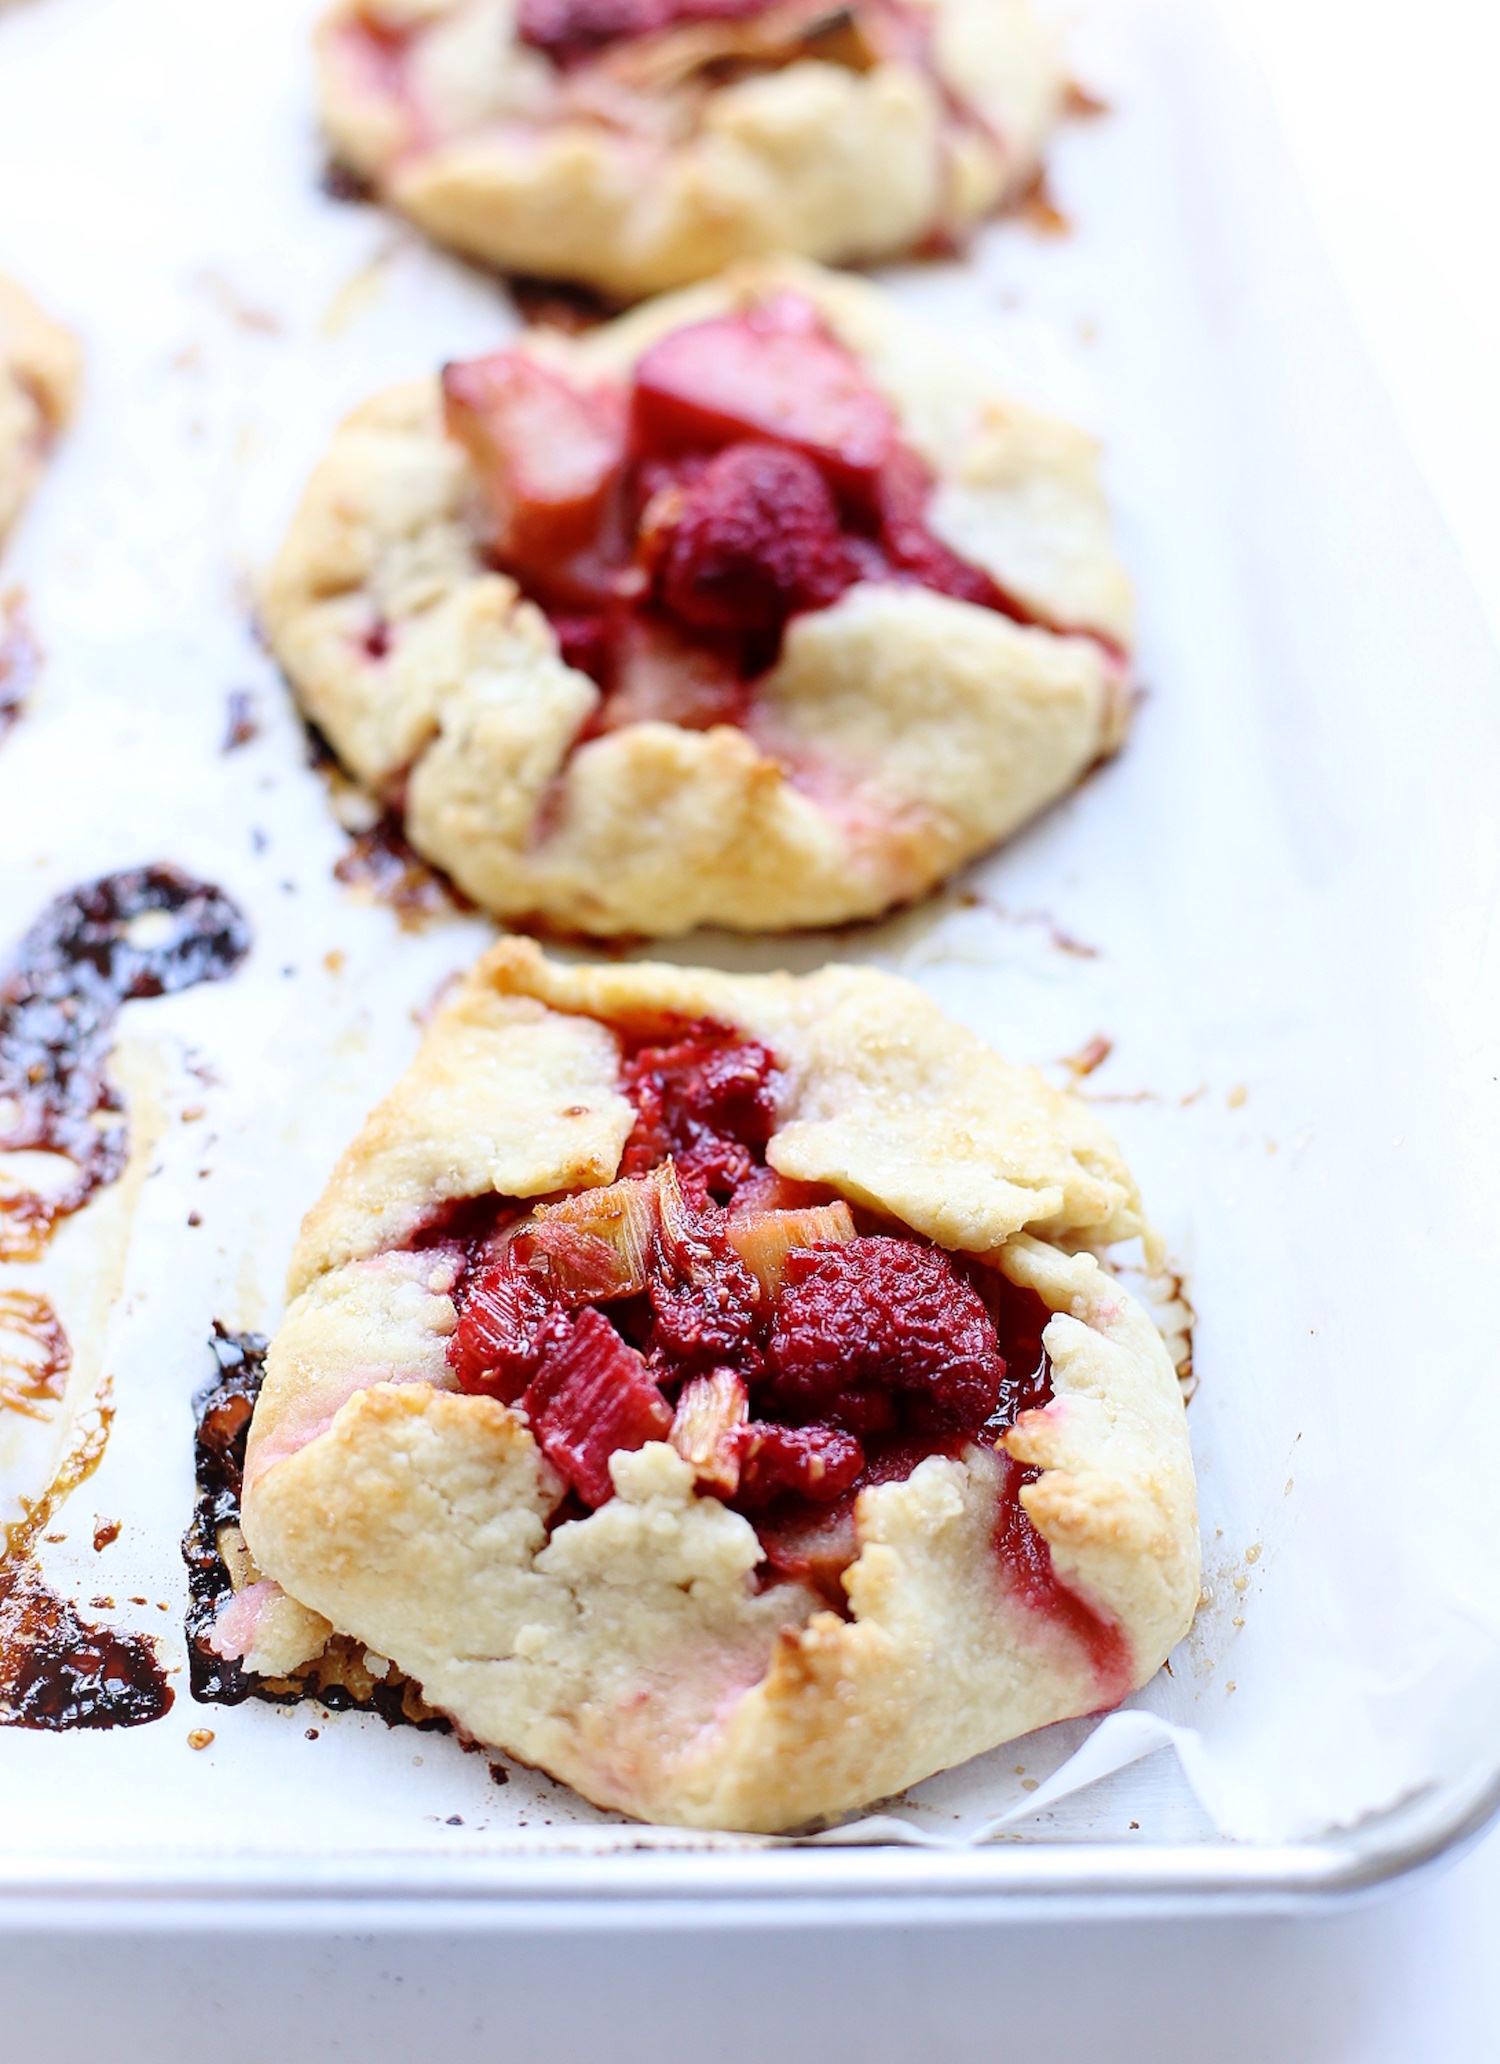 Mini Raspberry Rhubarb Galettes: amazing flaky, crispy crust with a tart raspberry-rhubarb filling. Perfect summer dessert! | TrufflesandTrends.com